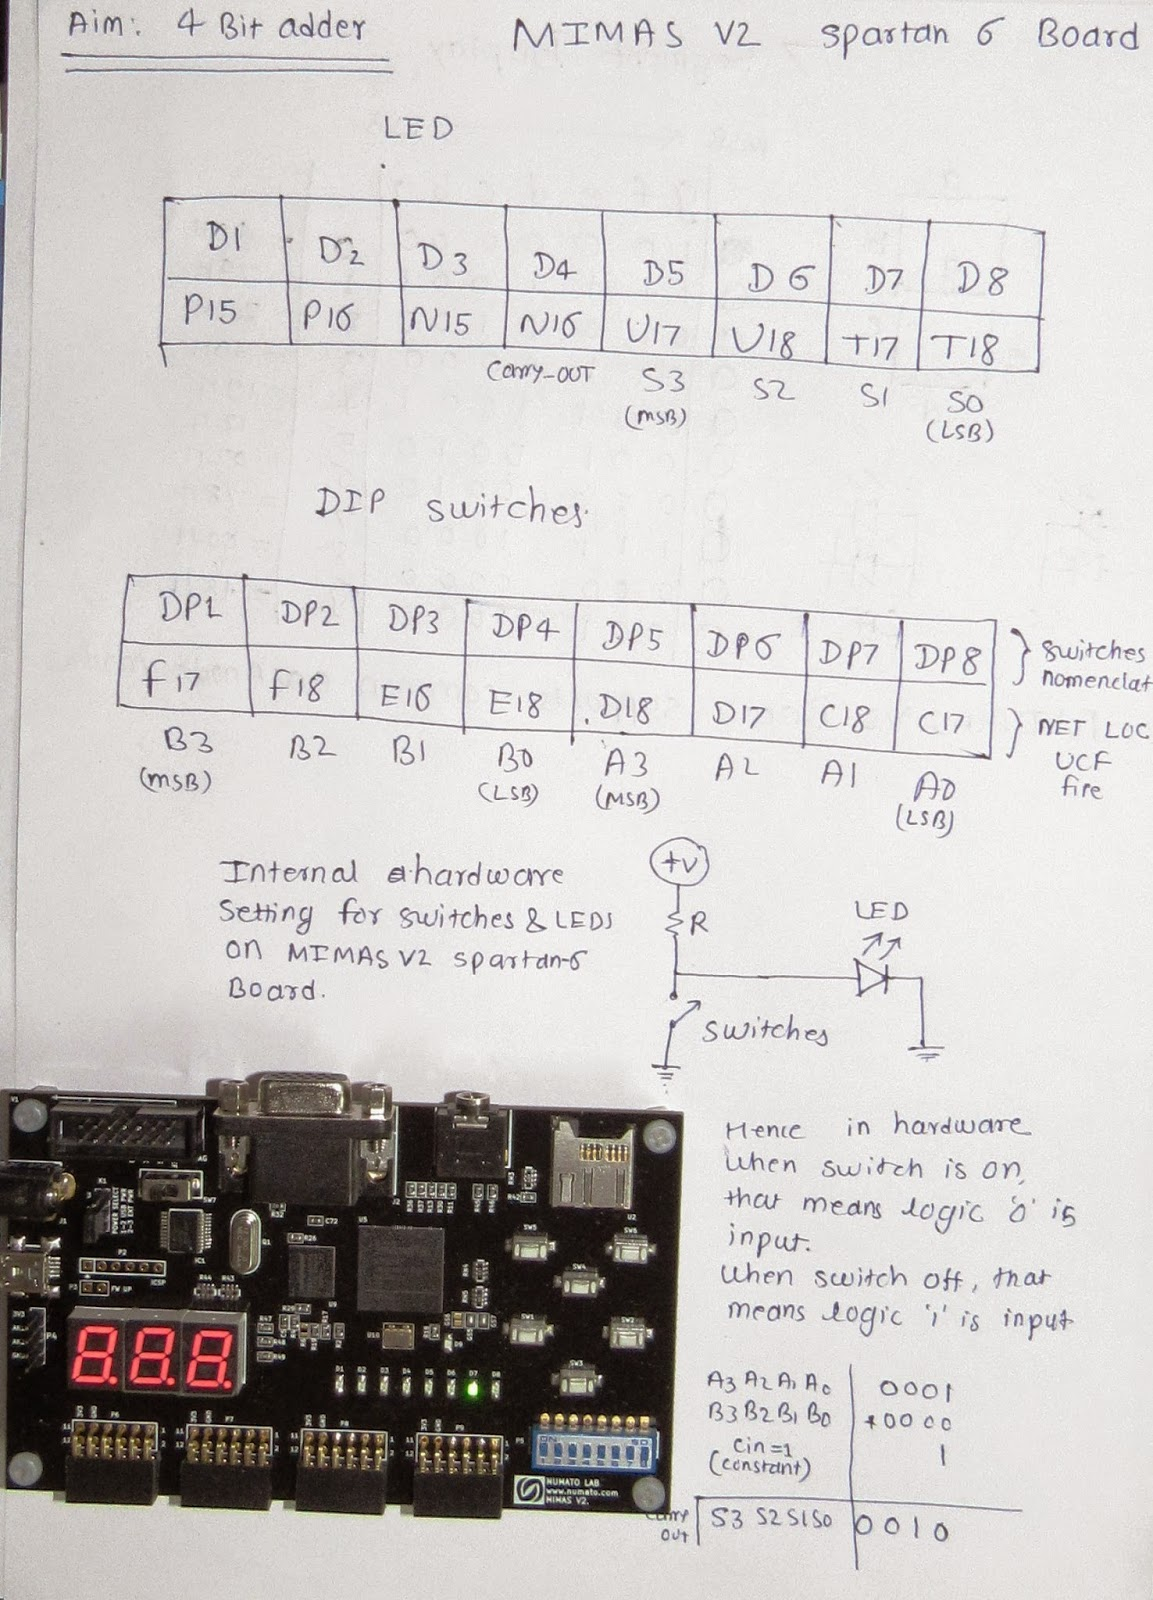 Vhdl Coding Mimas V2 Spartan 6 Fpga Board 4 Bit Adder Circuit Logic Diagram Click Here For Project Files